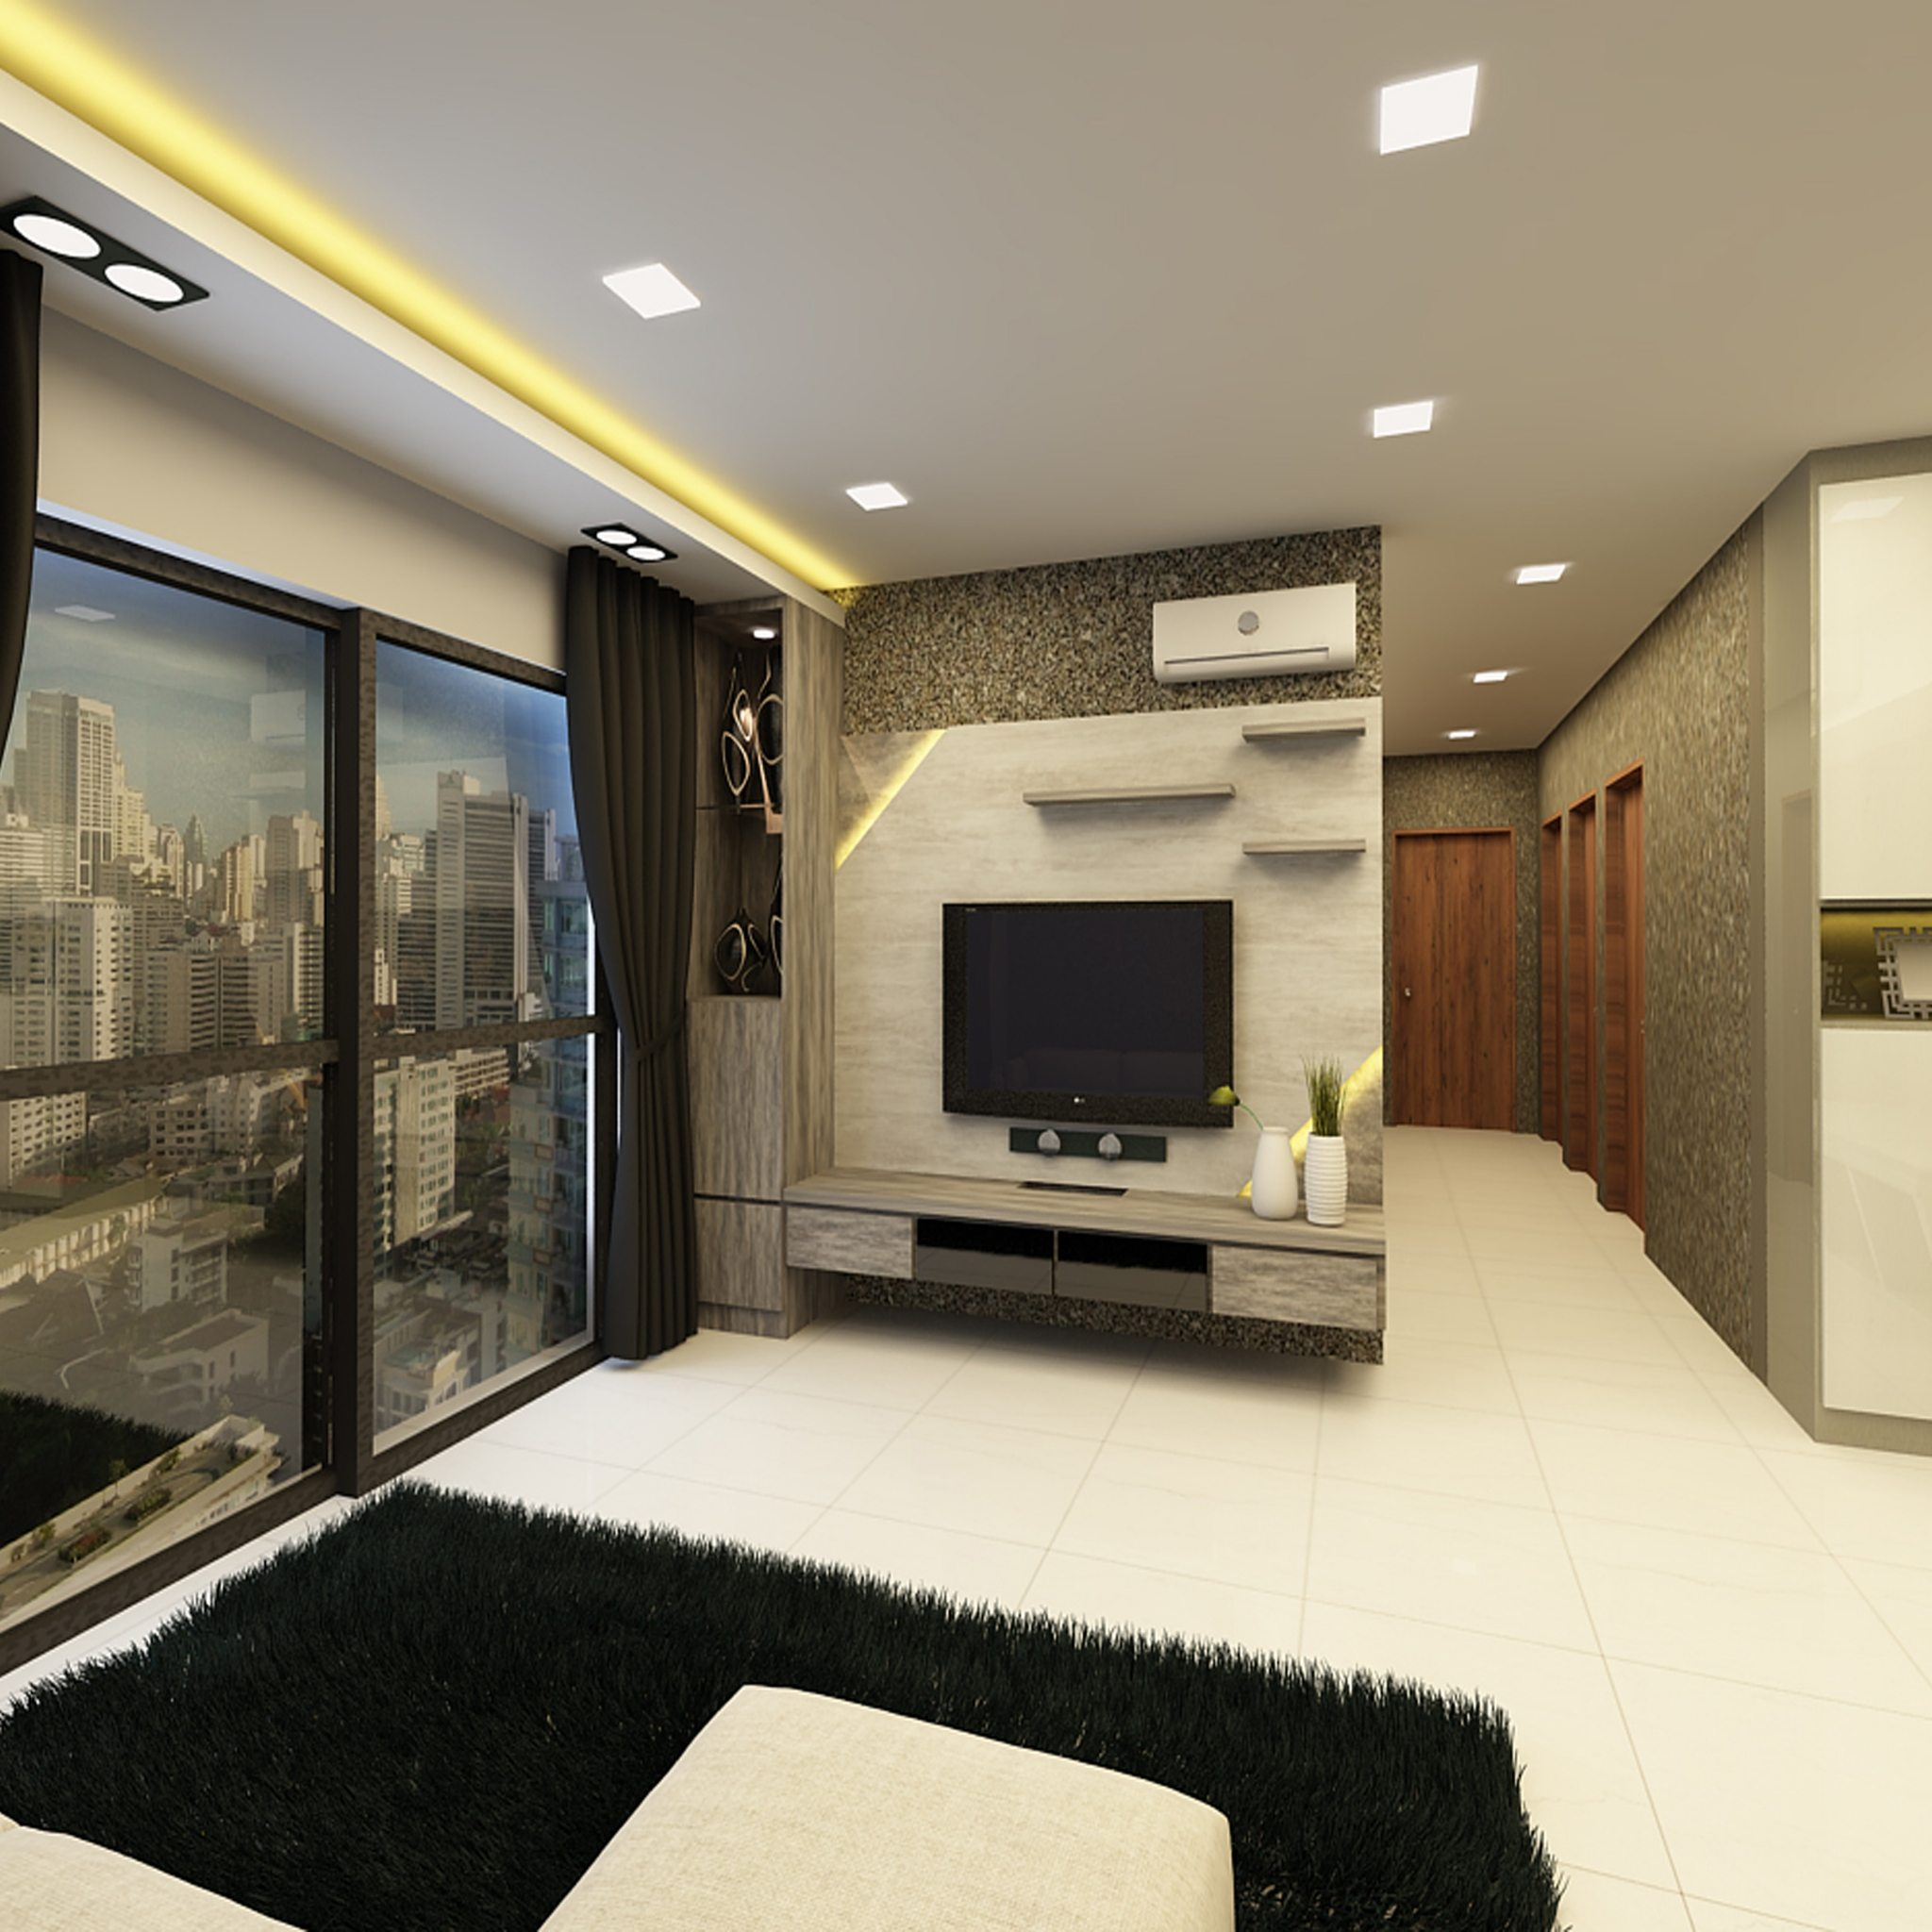 Famous Interior Design Firms Singapore